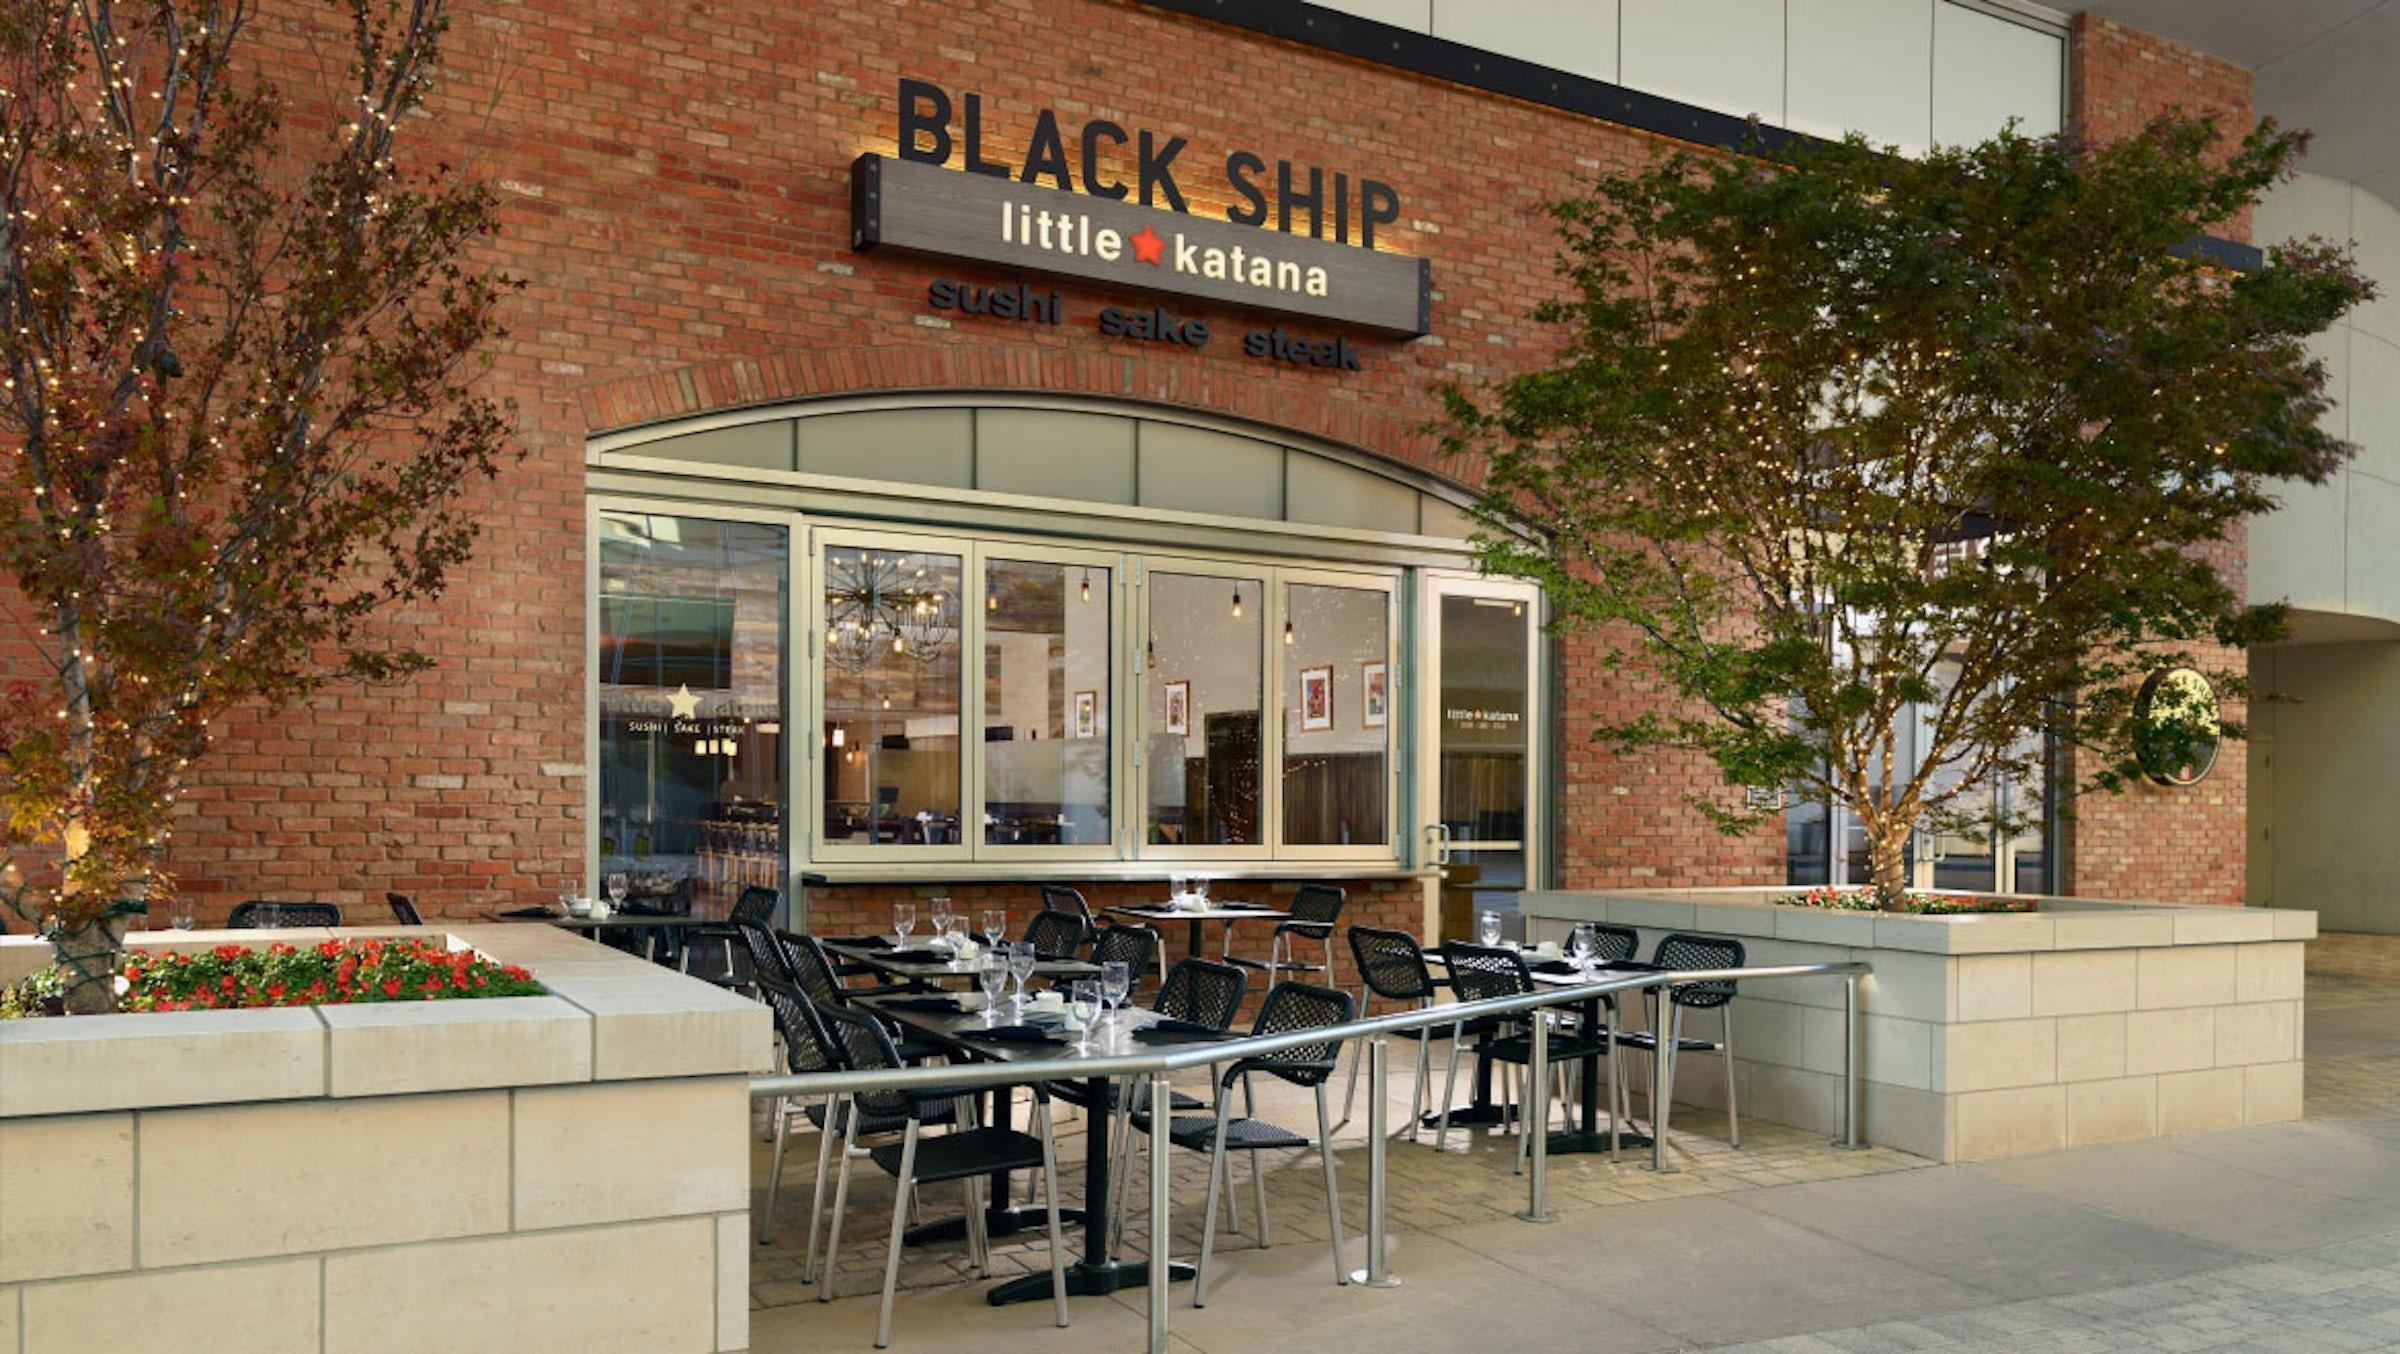 Black Ship Little Katana in Beyond Dallas